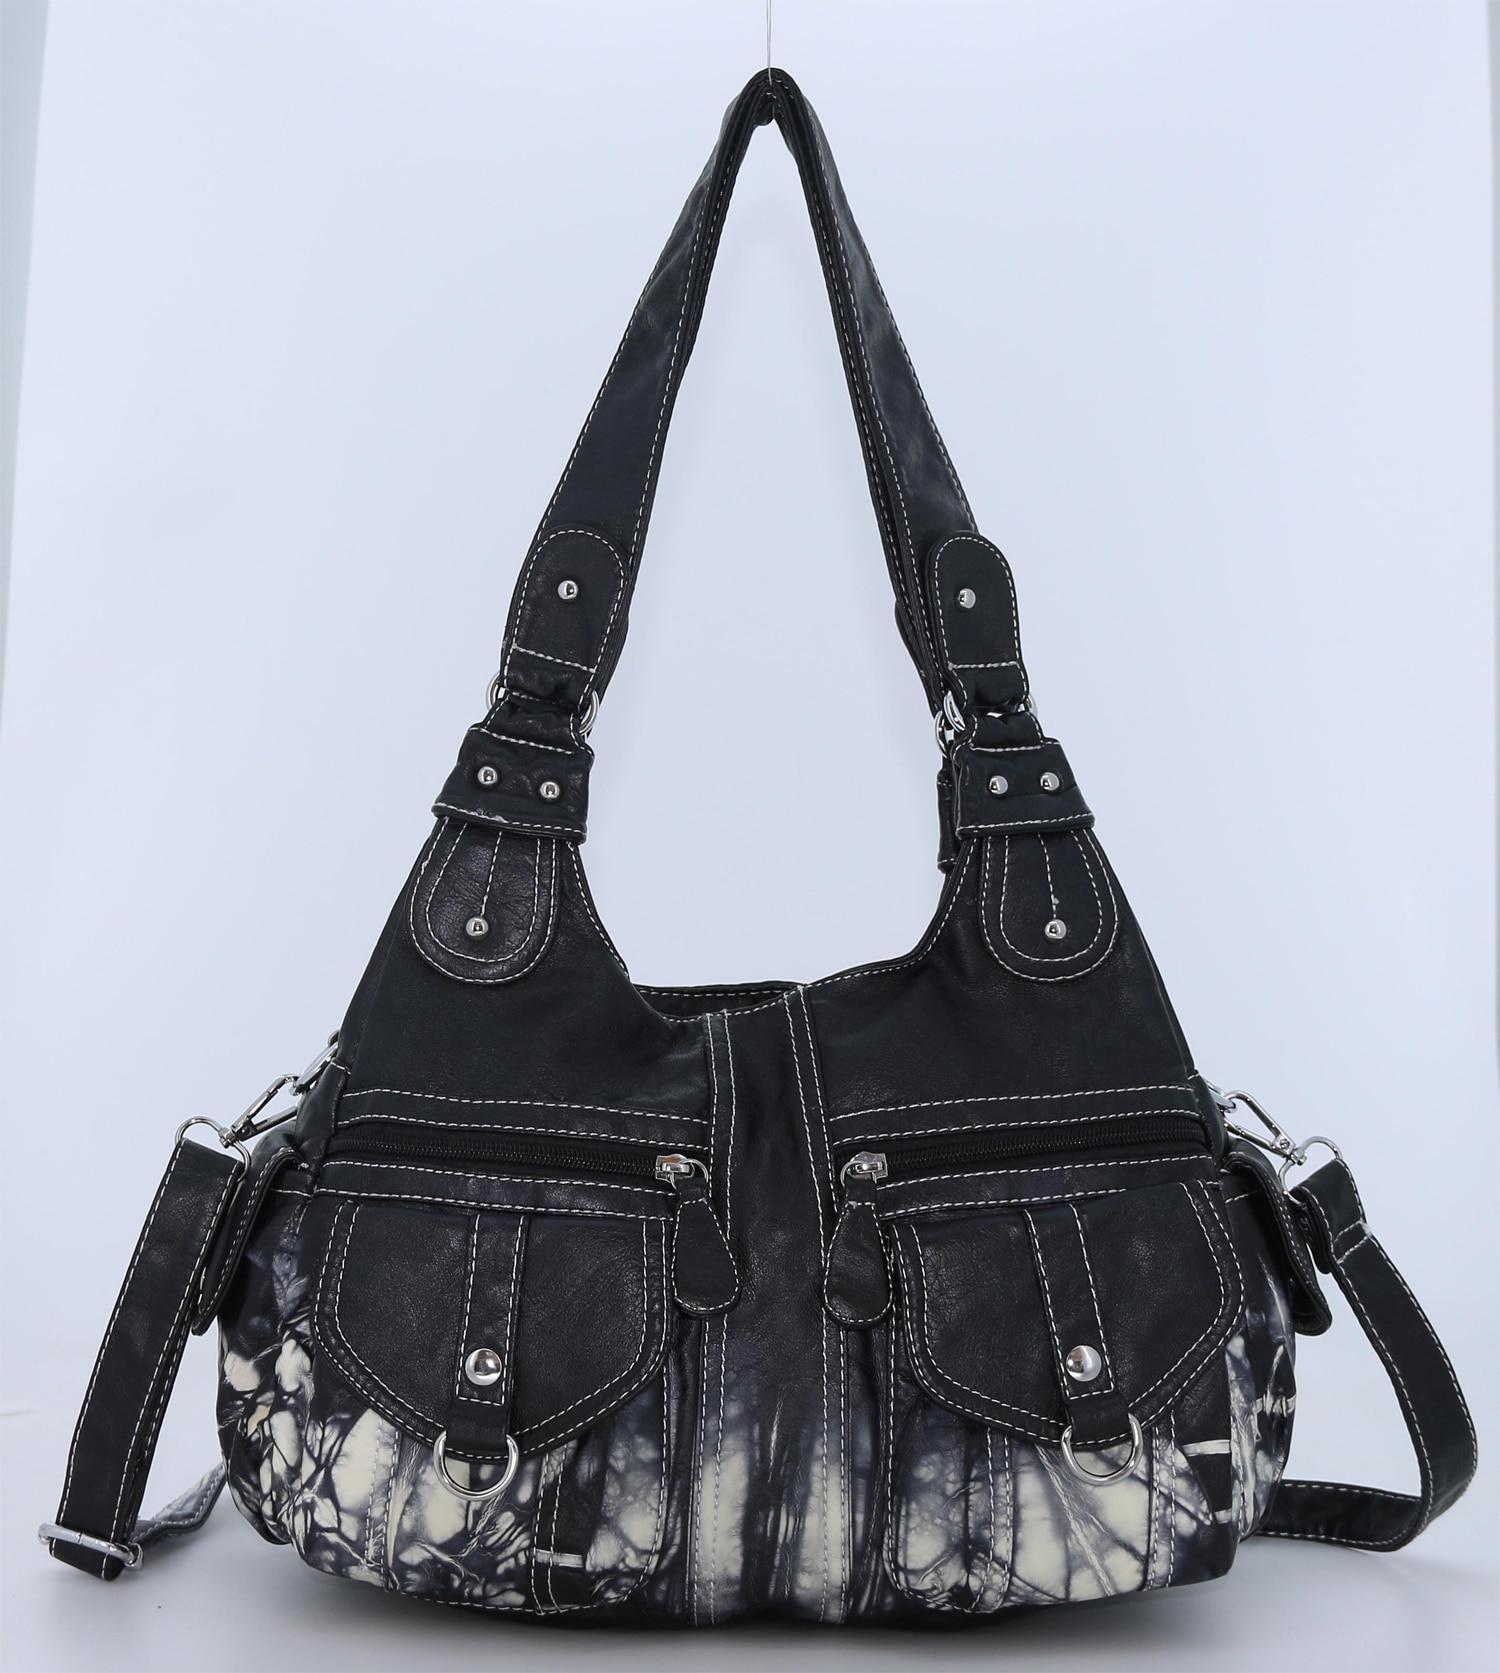 Angel Kiss-حقيبة يد نسائية من جلد البولي يوريثان ، حقيبة كتف مصبوغة ، عتيقة